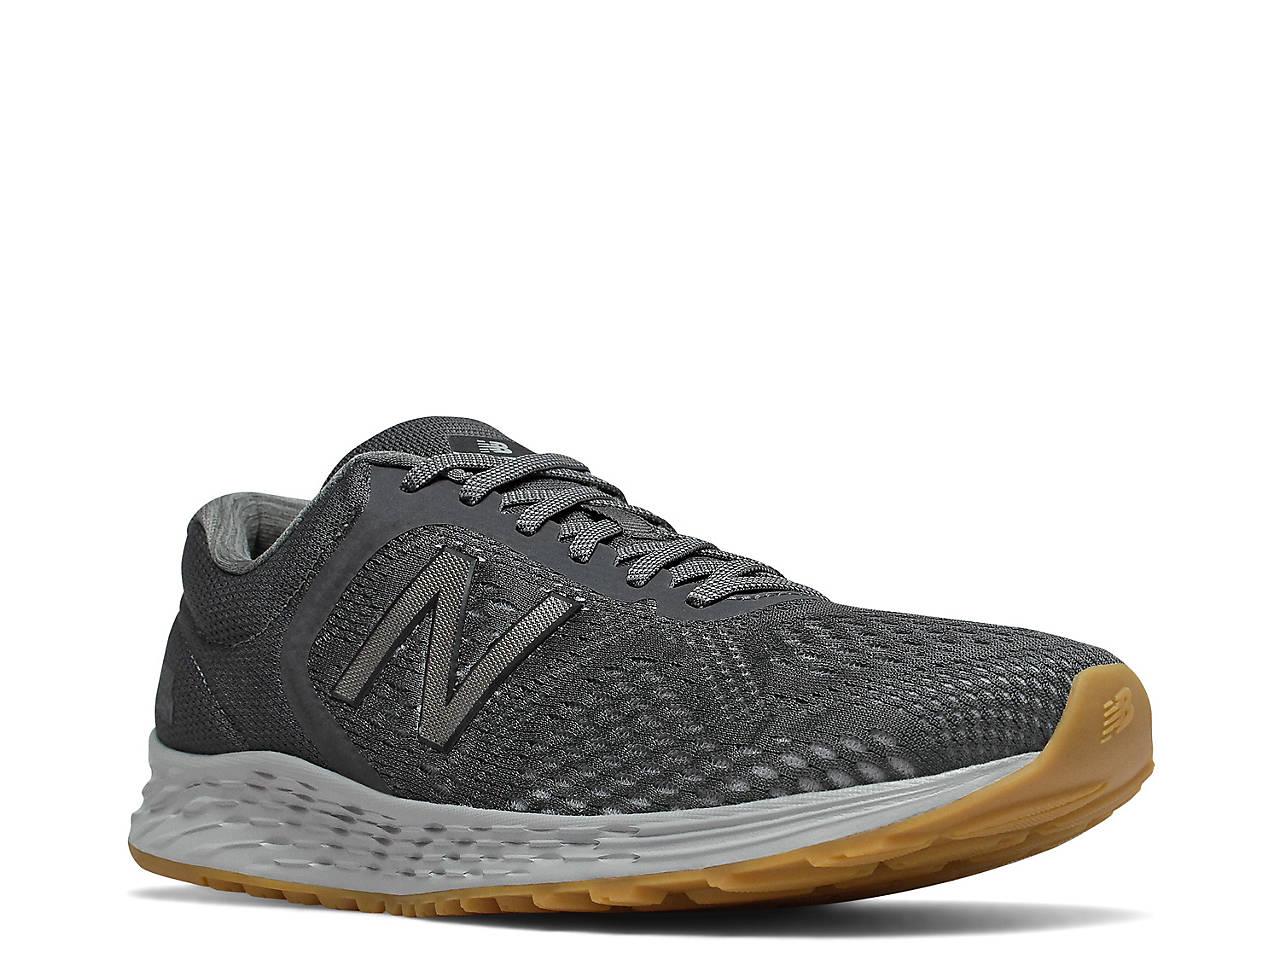 ed787a25f0bb4 New Balance Arishi v2 Sneaker - Men's Men's Shoes | DSW